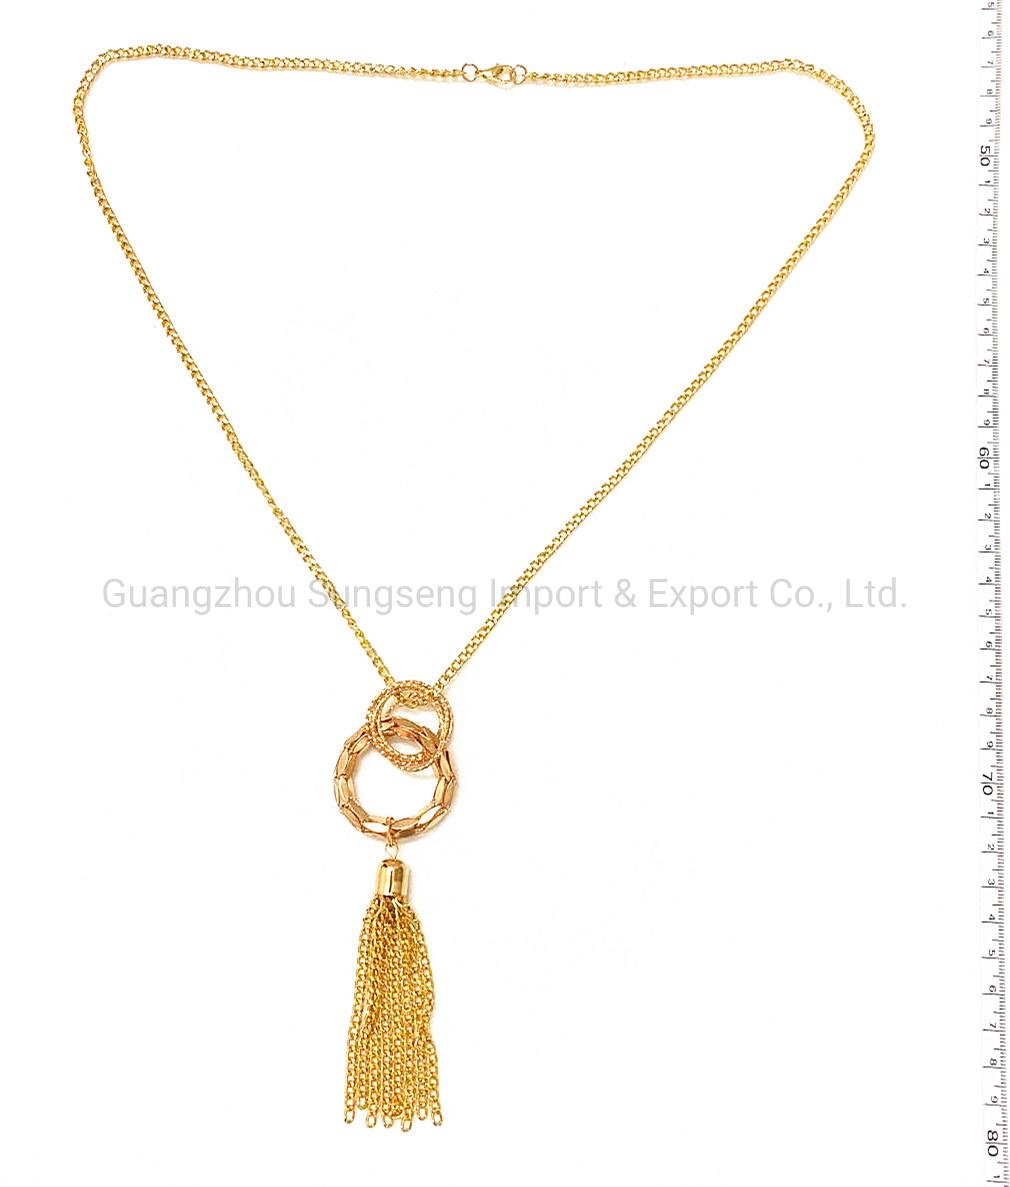 Mode Sieraden Kleding Accessoires Metal Fashion ketting, kan worden aangepast